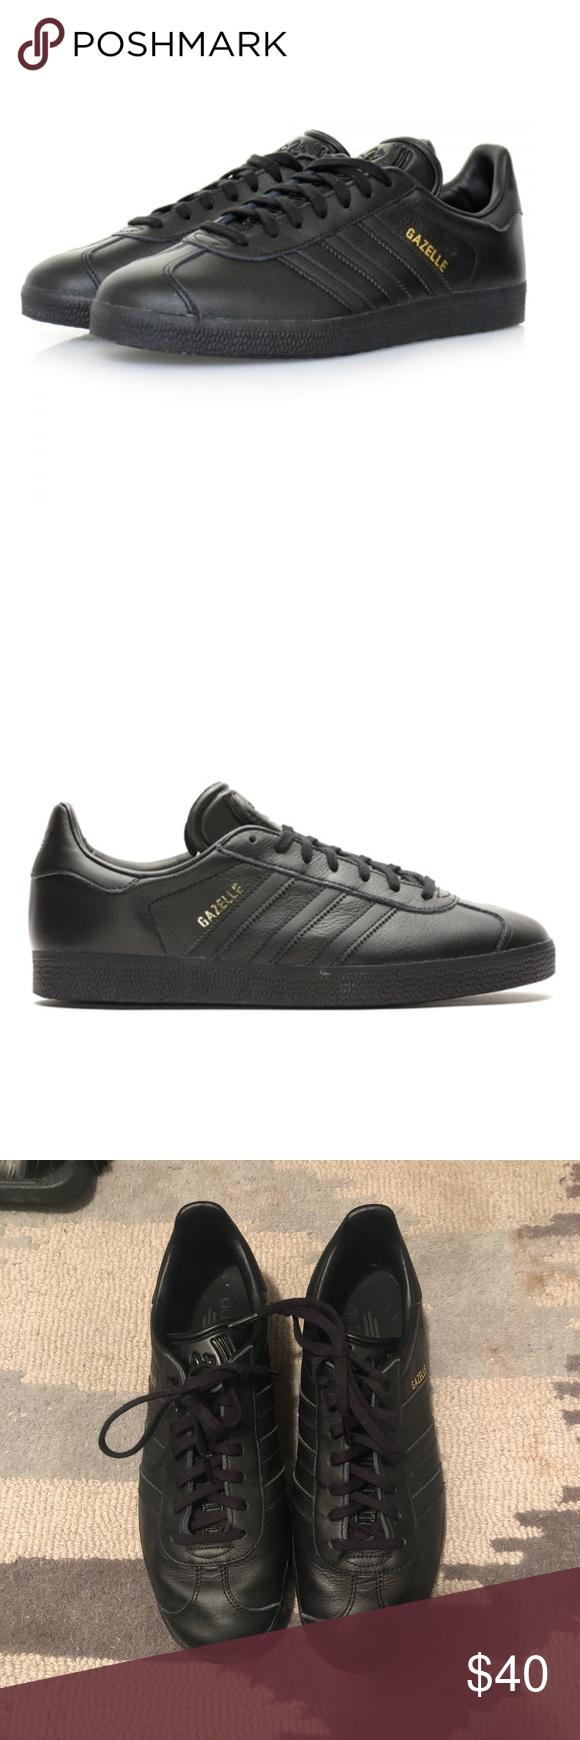 adidas gazelle black leather mens